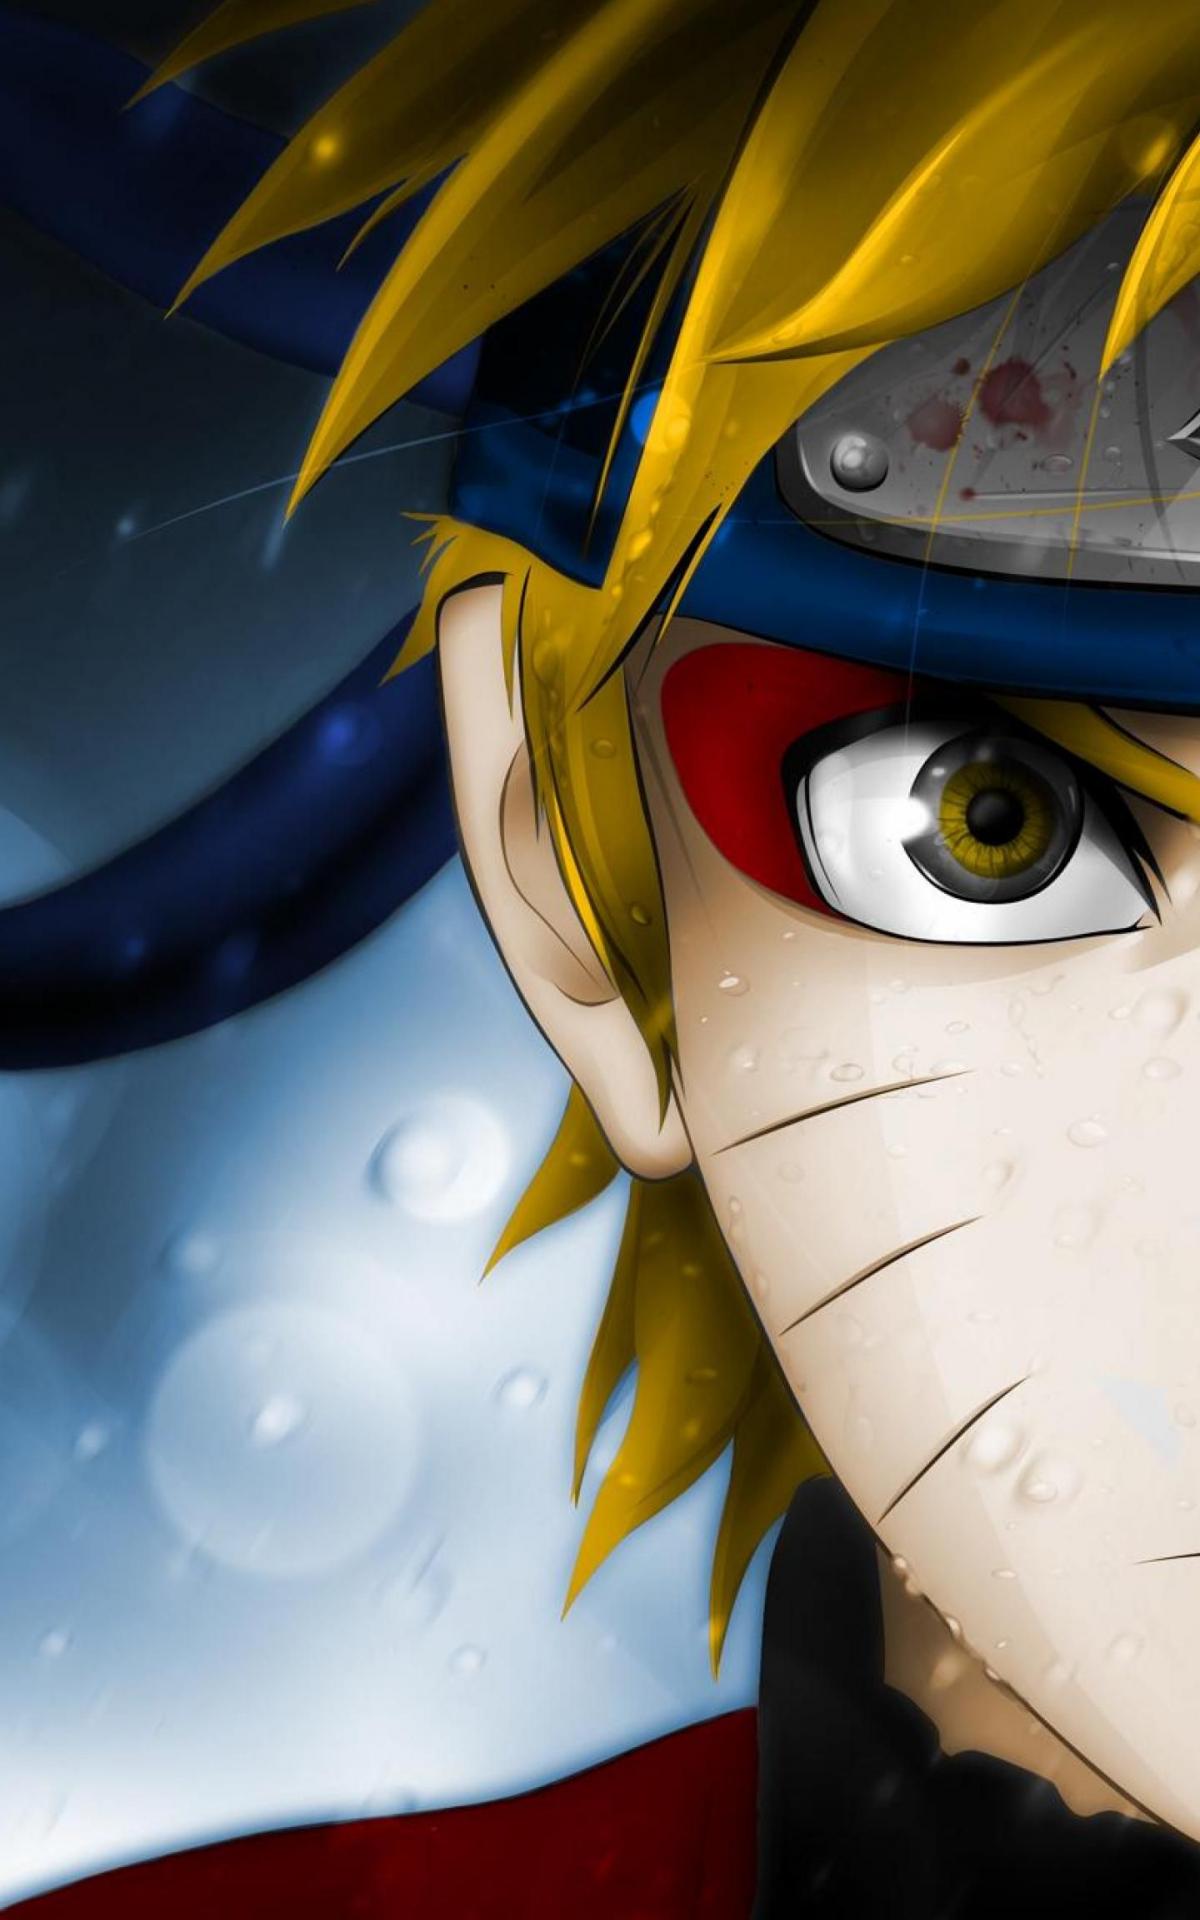 4k Wallpaper Of Naruto - Anime Wallpaper HD